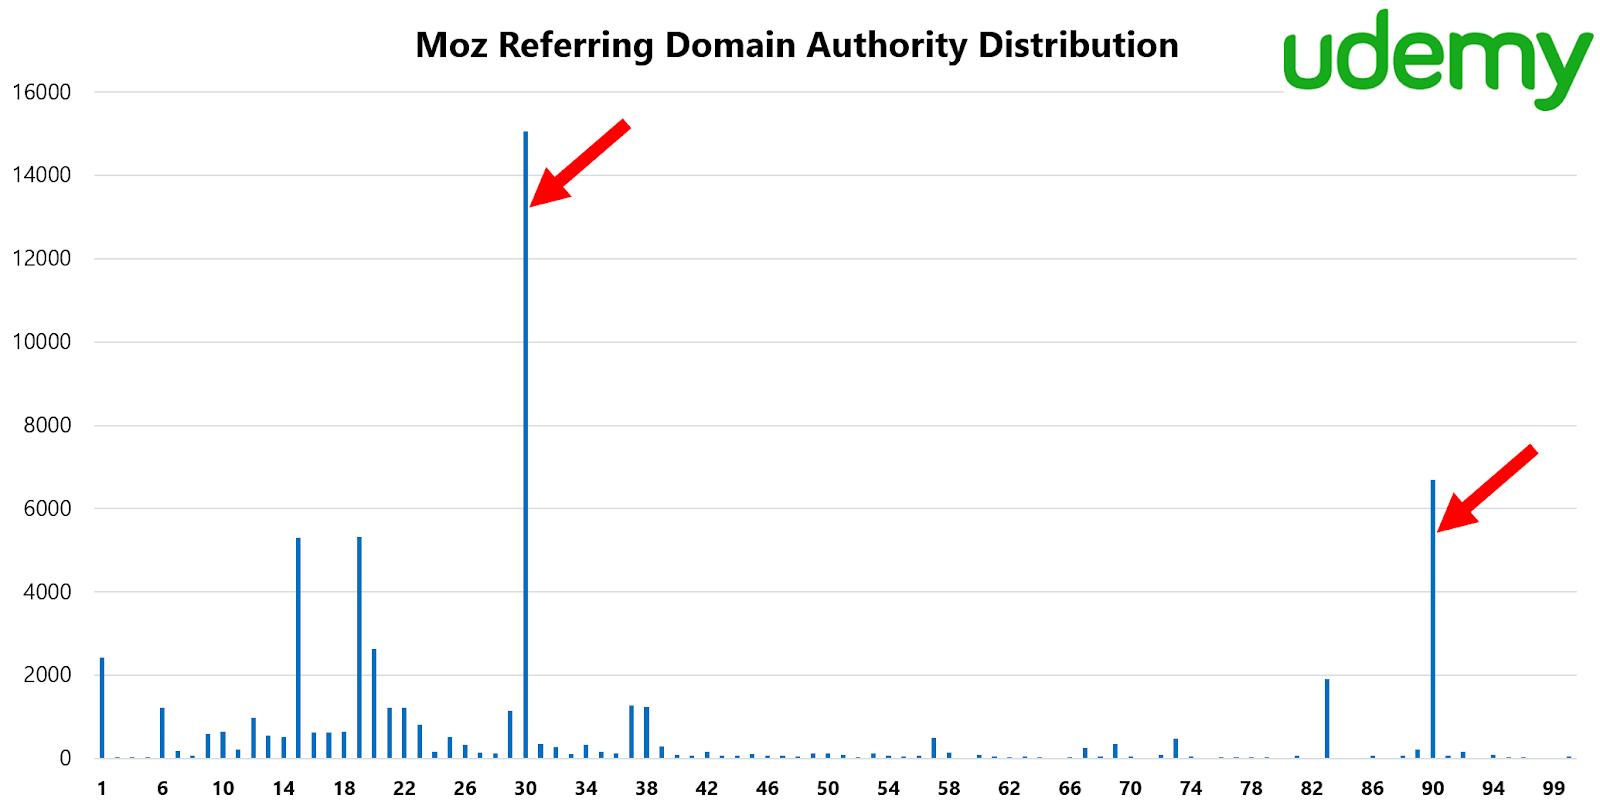 Moz Referring domain Authority